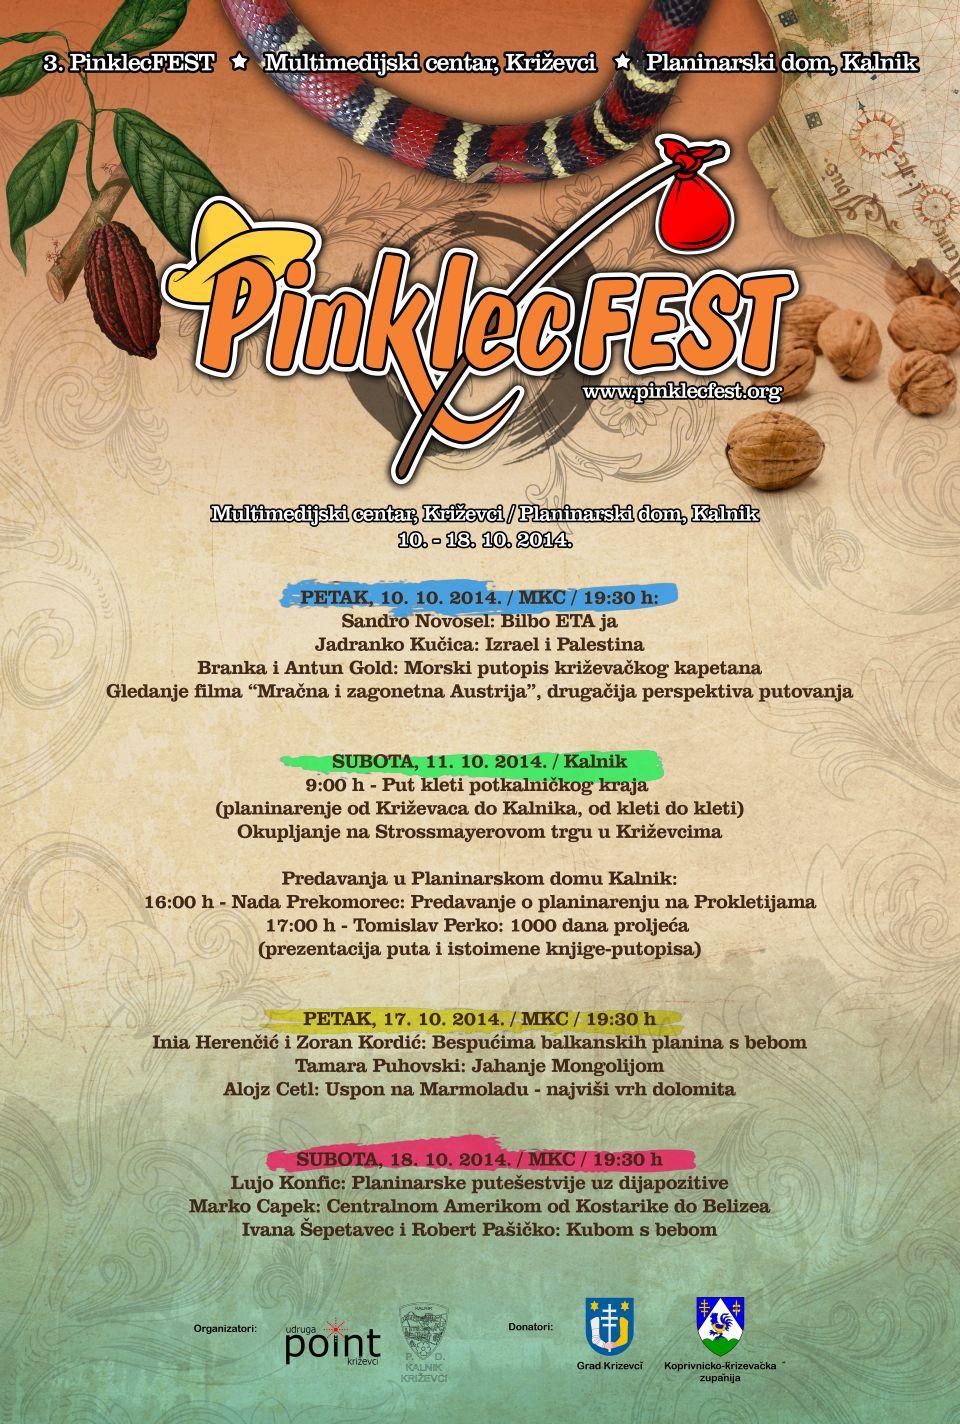 Pinklecfest 2014 - plakat 960 x 1424